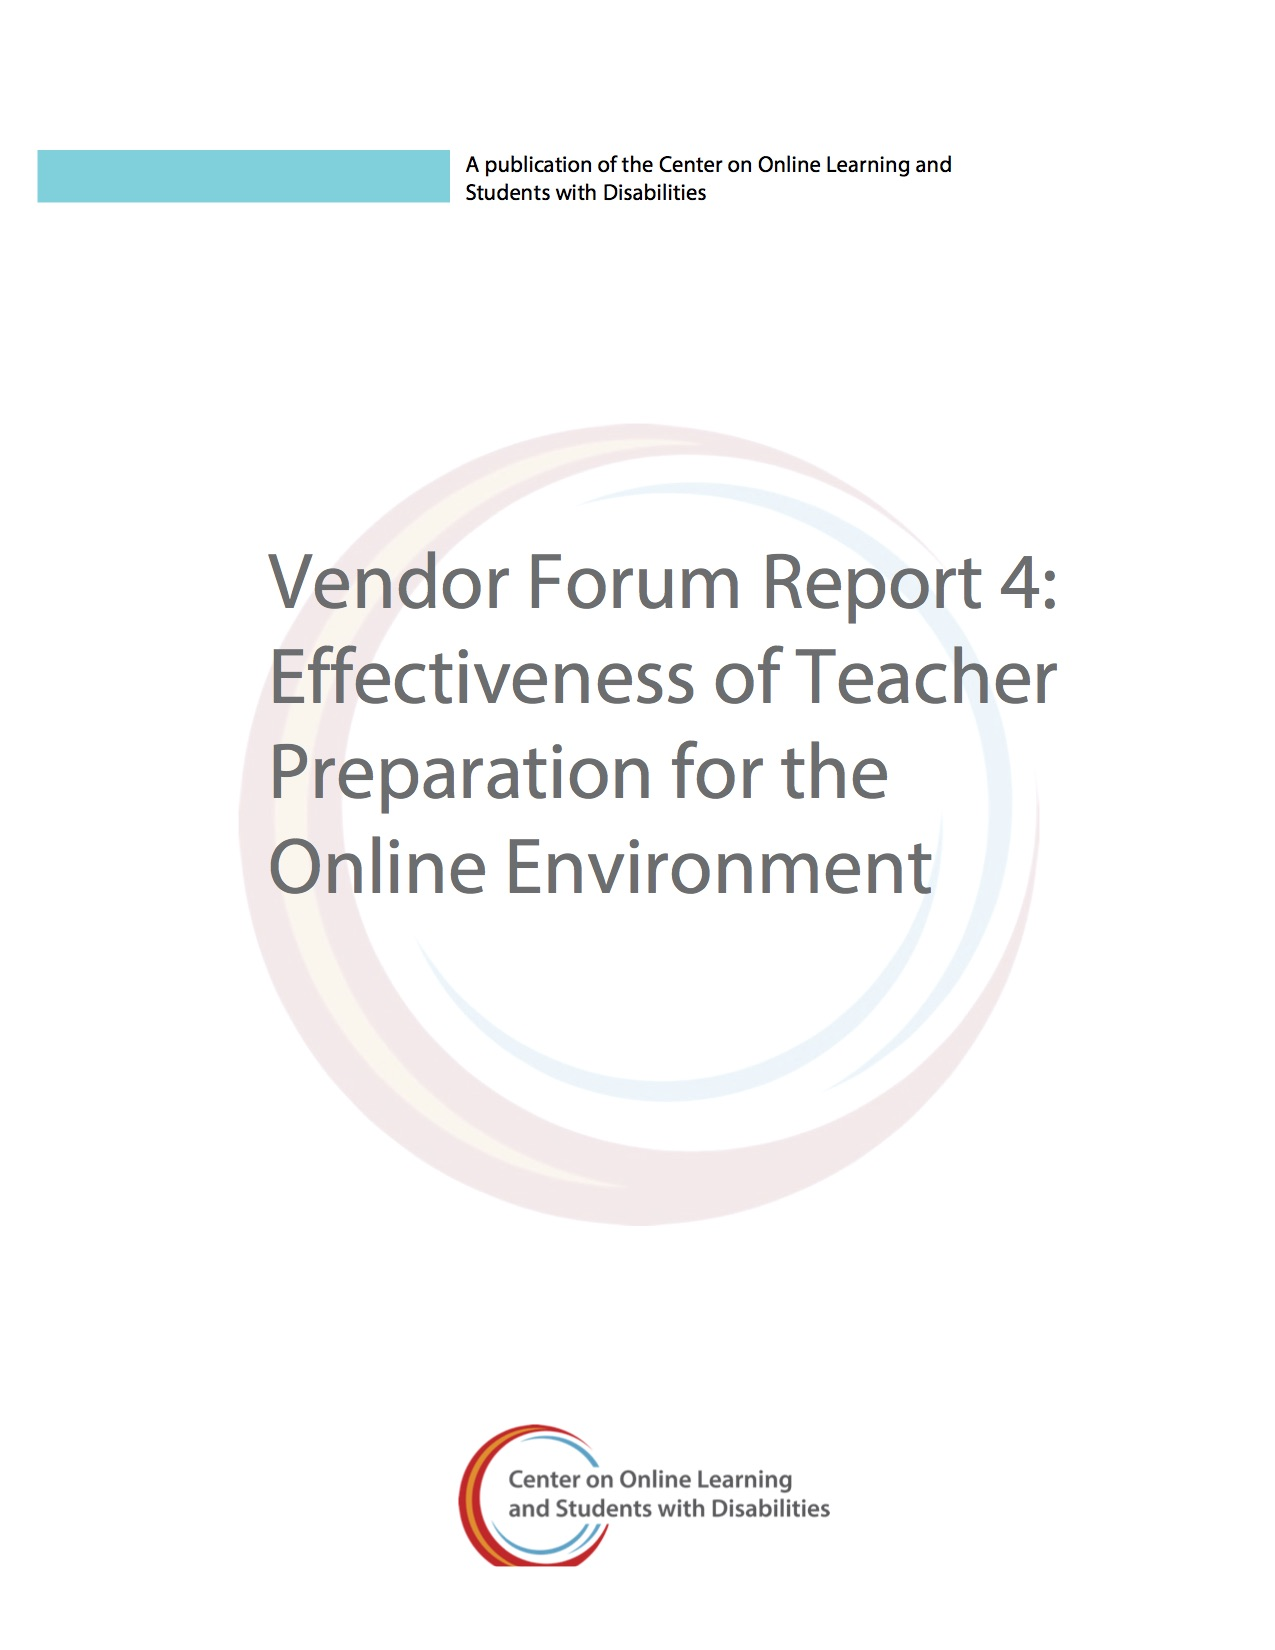 Vendor Forum Report 4: Effectiveness Of Teacher Preparation For The Online Environment